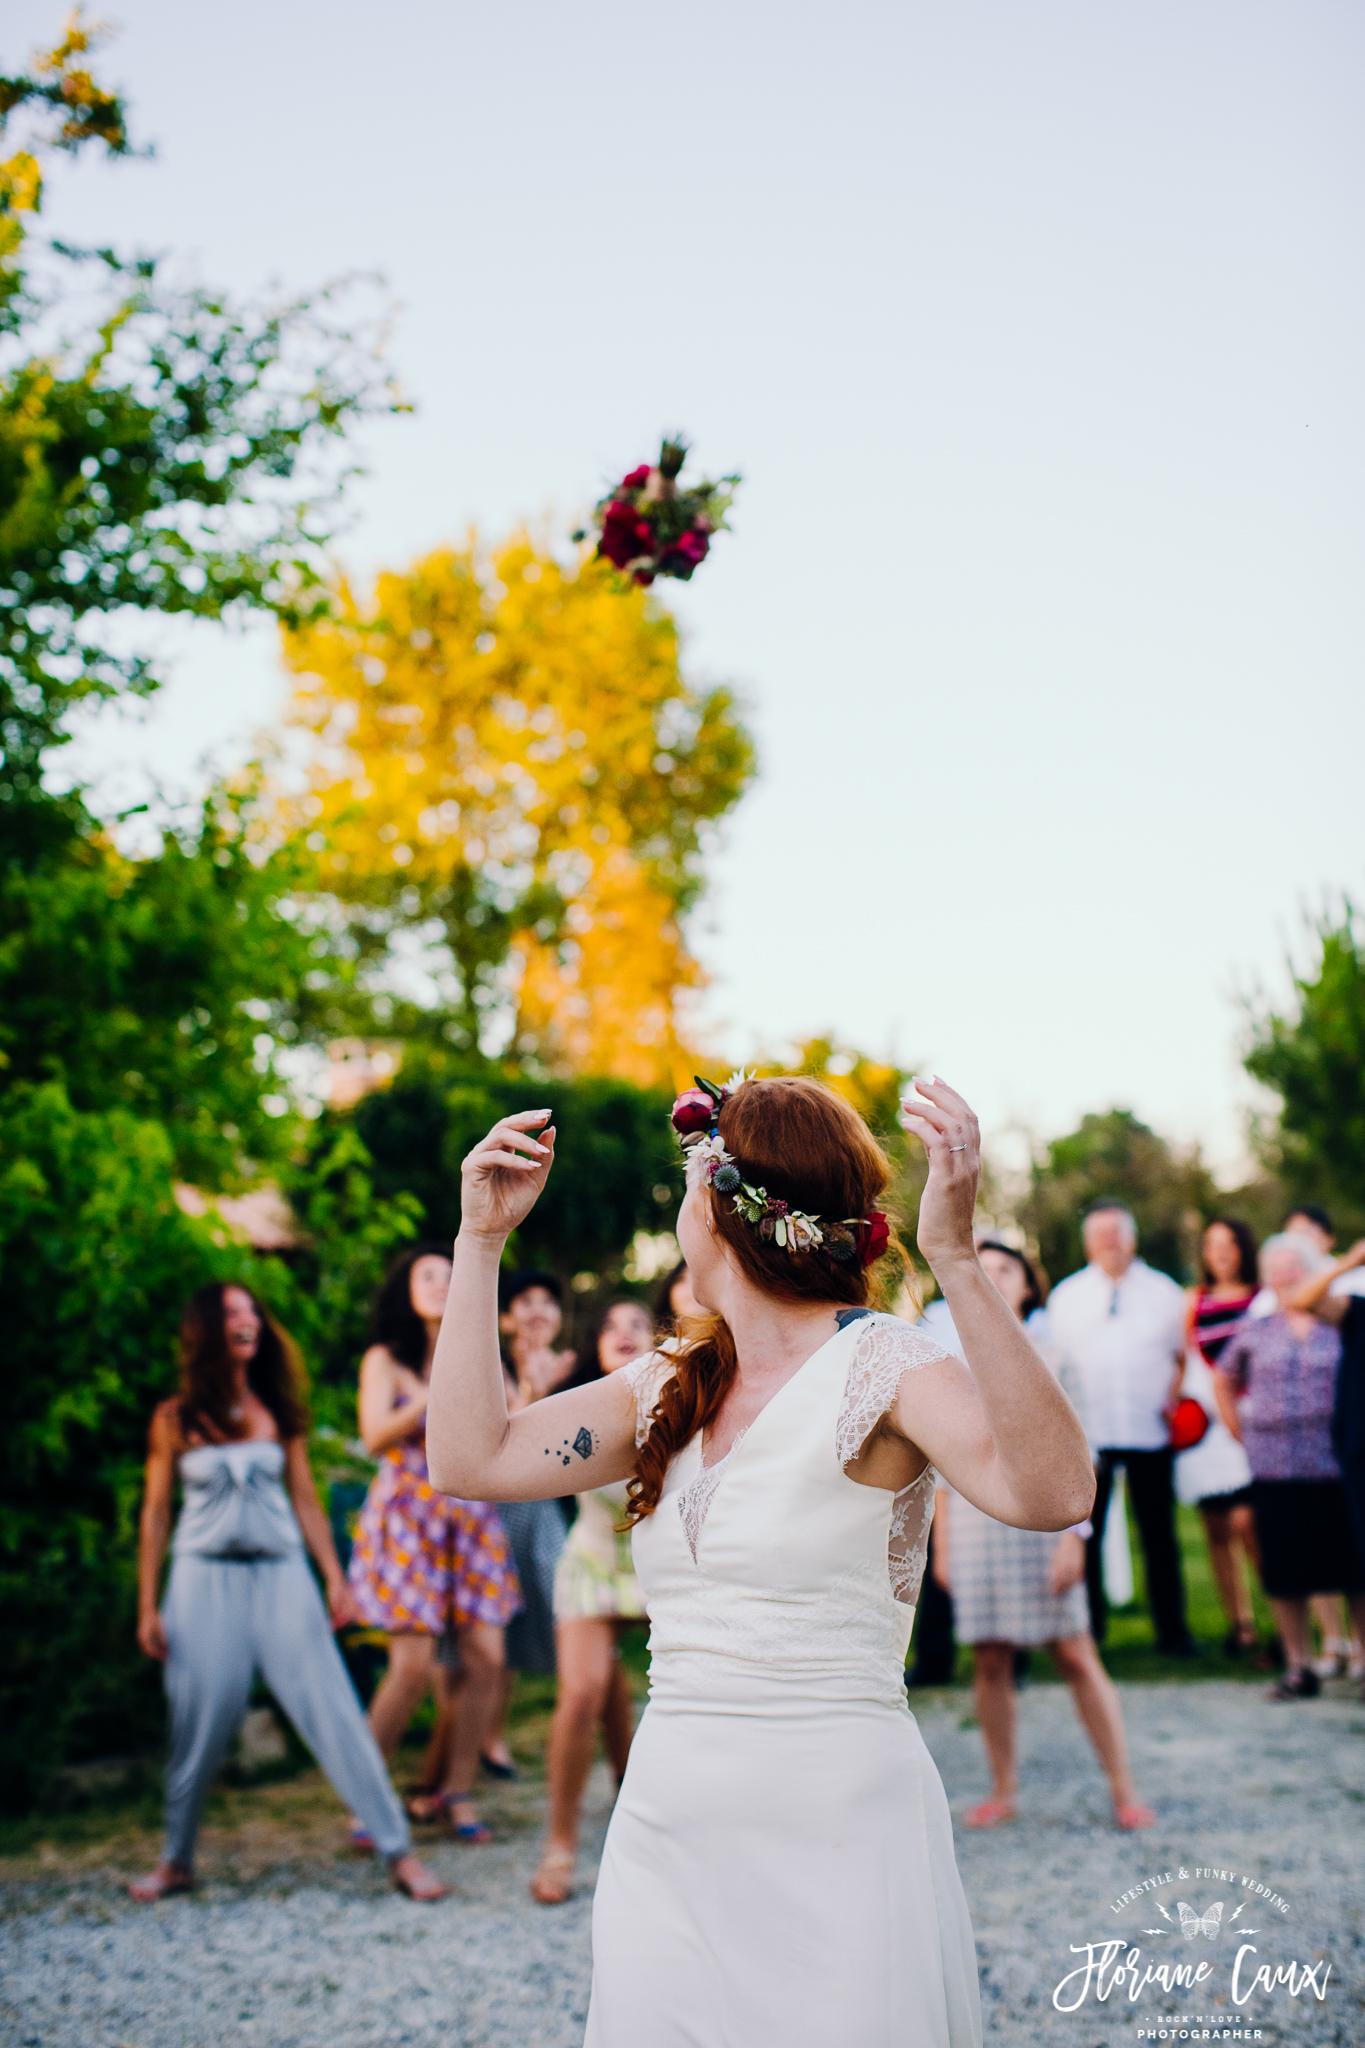 photographe-mariage-toulouse-rocknroll-maries-tatoues-floriane-caux-90